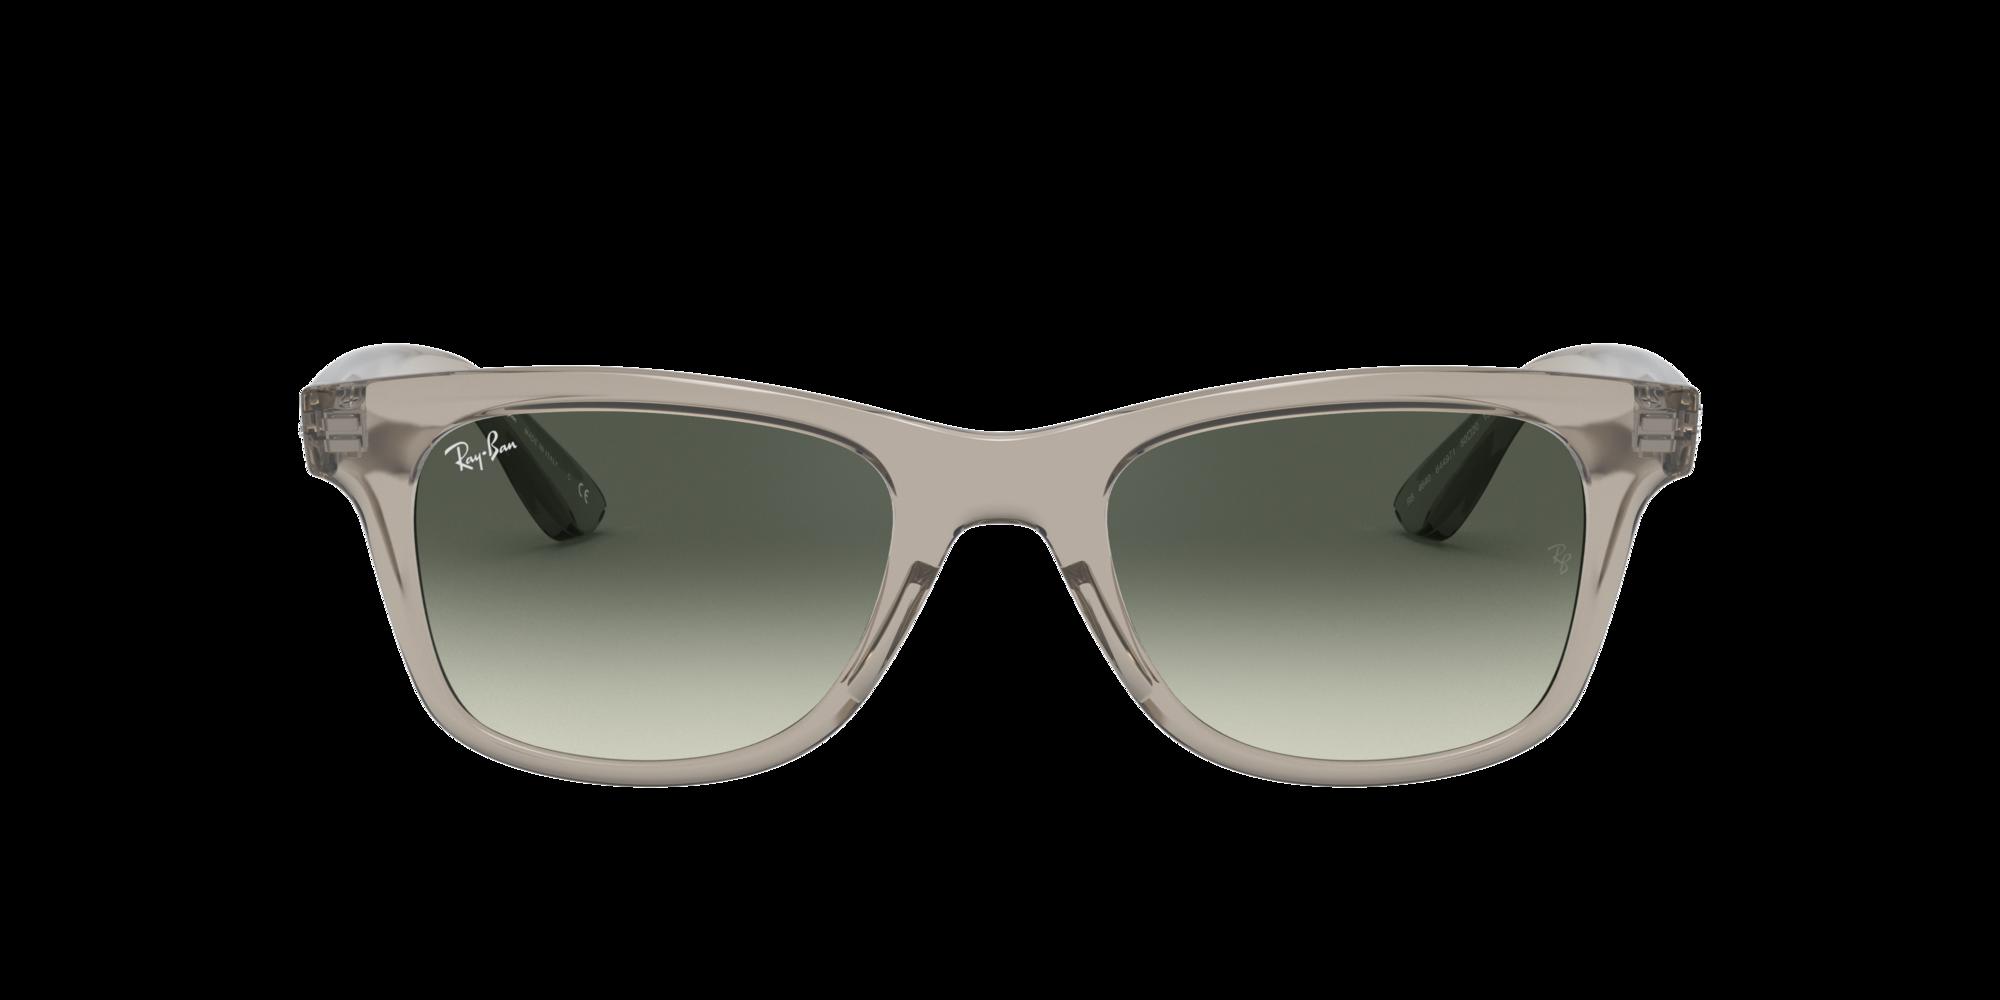 Image for RB4640 from LensCrafters   Glasses, Prescription Glasses Online, Eyewear